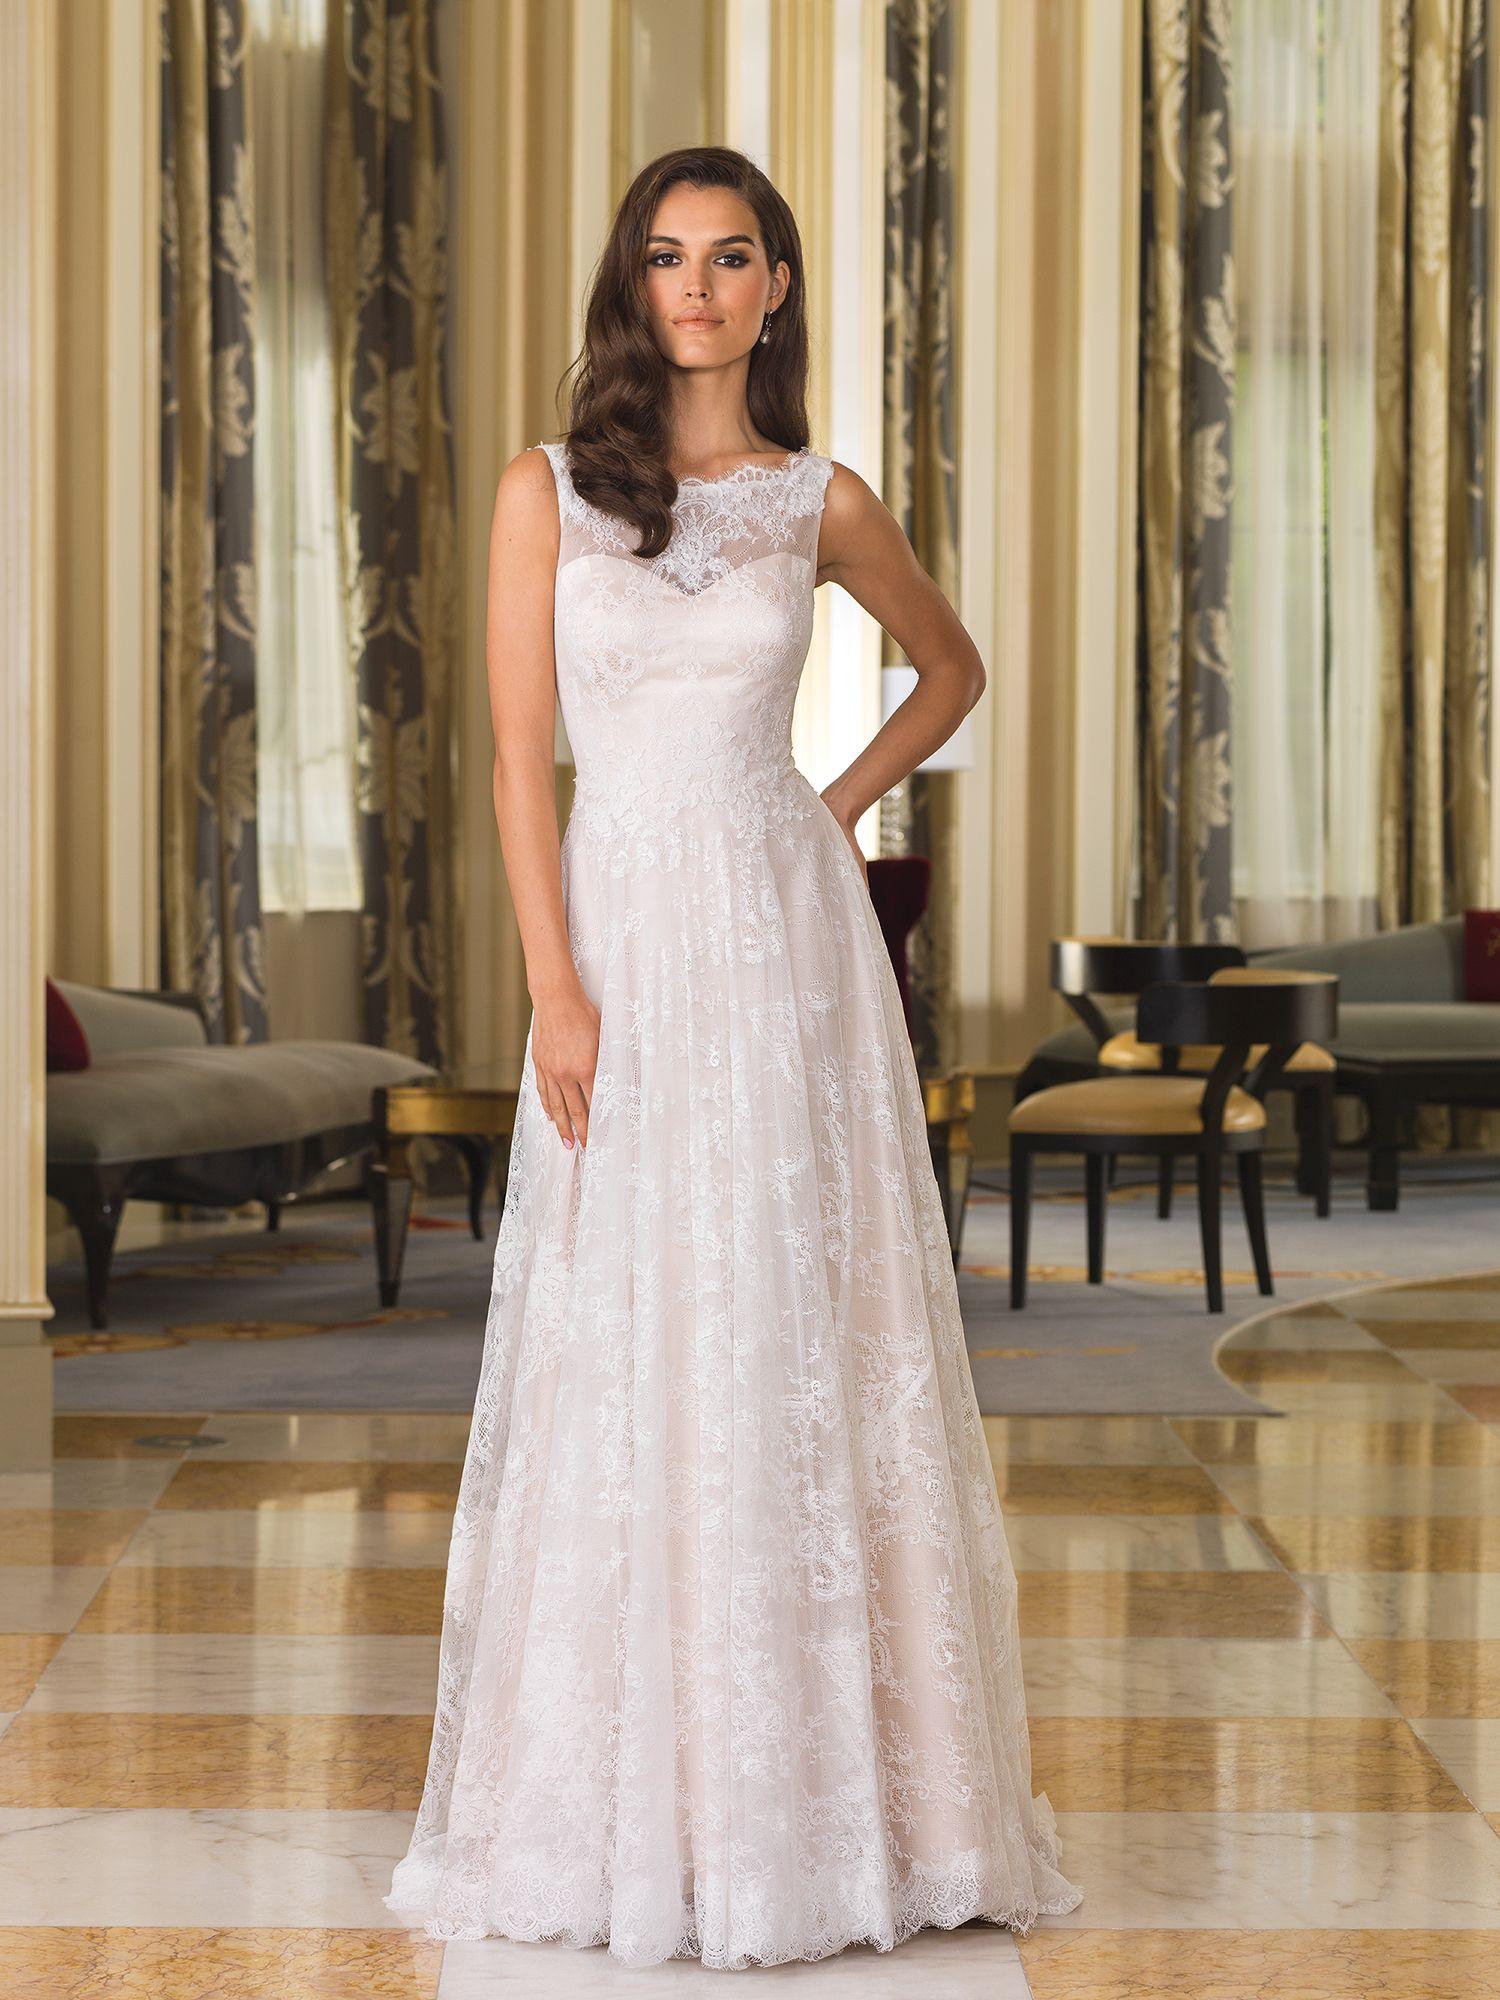 Justin Alexander Wedding Dresses Style 8857 Justin Alexander Wedding Dress Justin Alexander Bridal Wedding Dresses